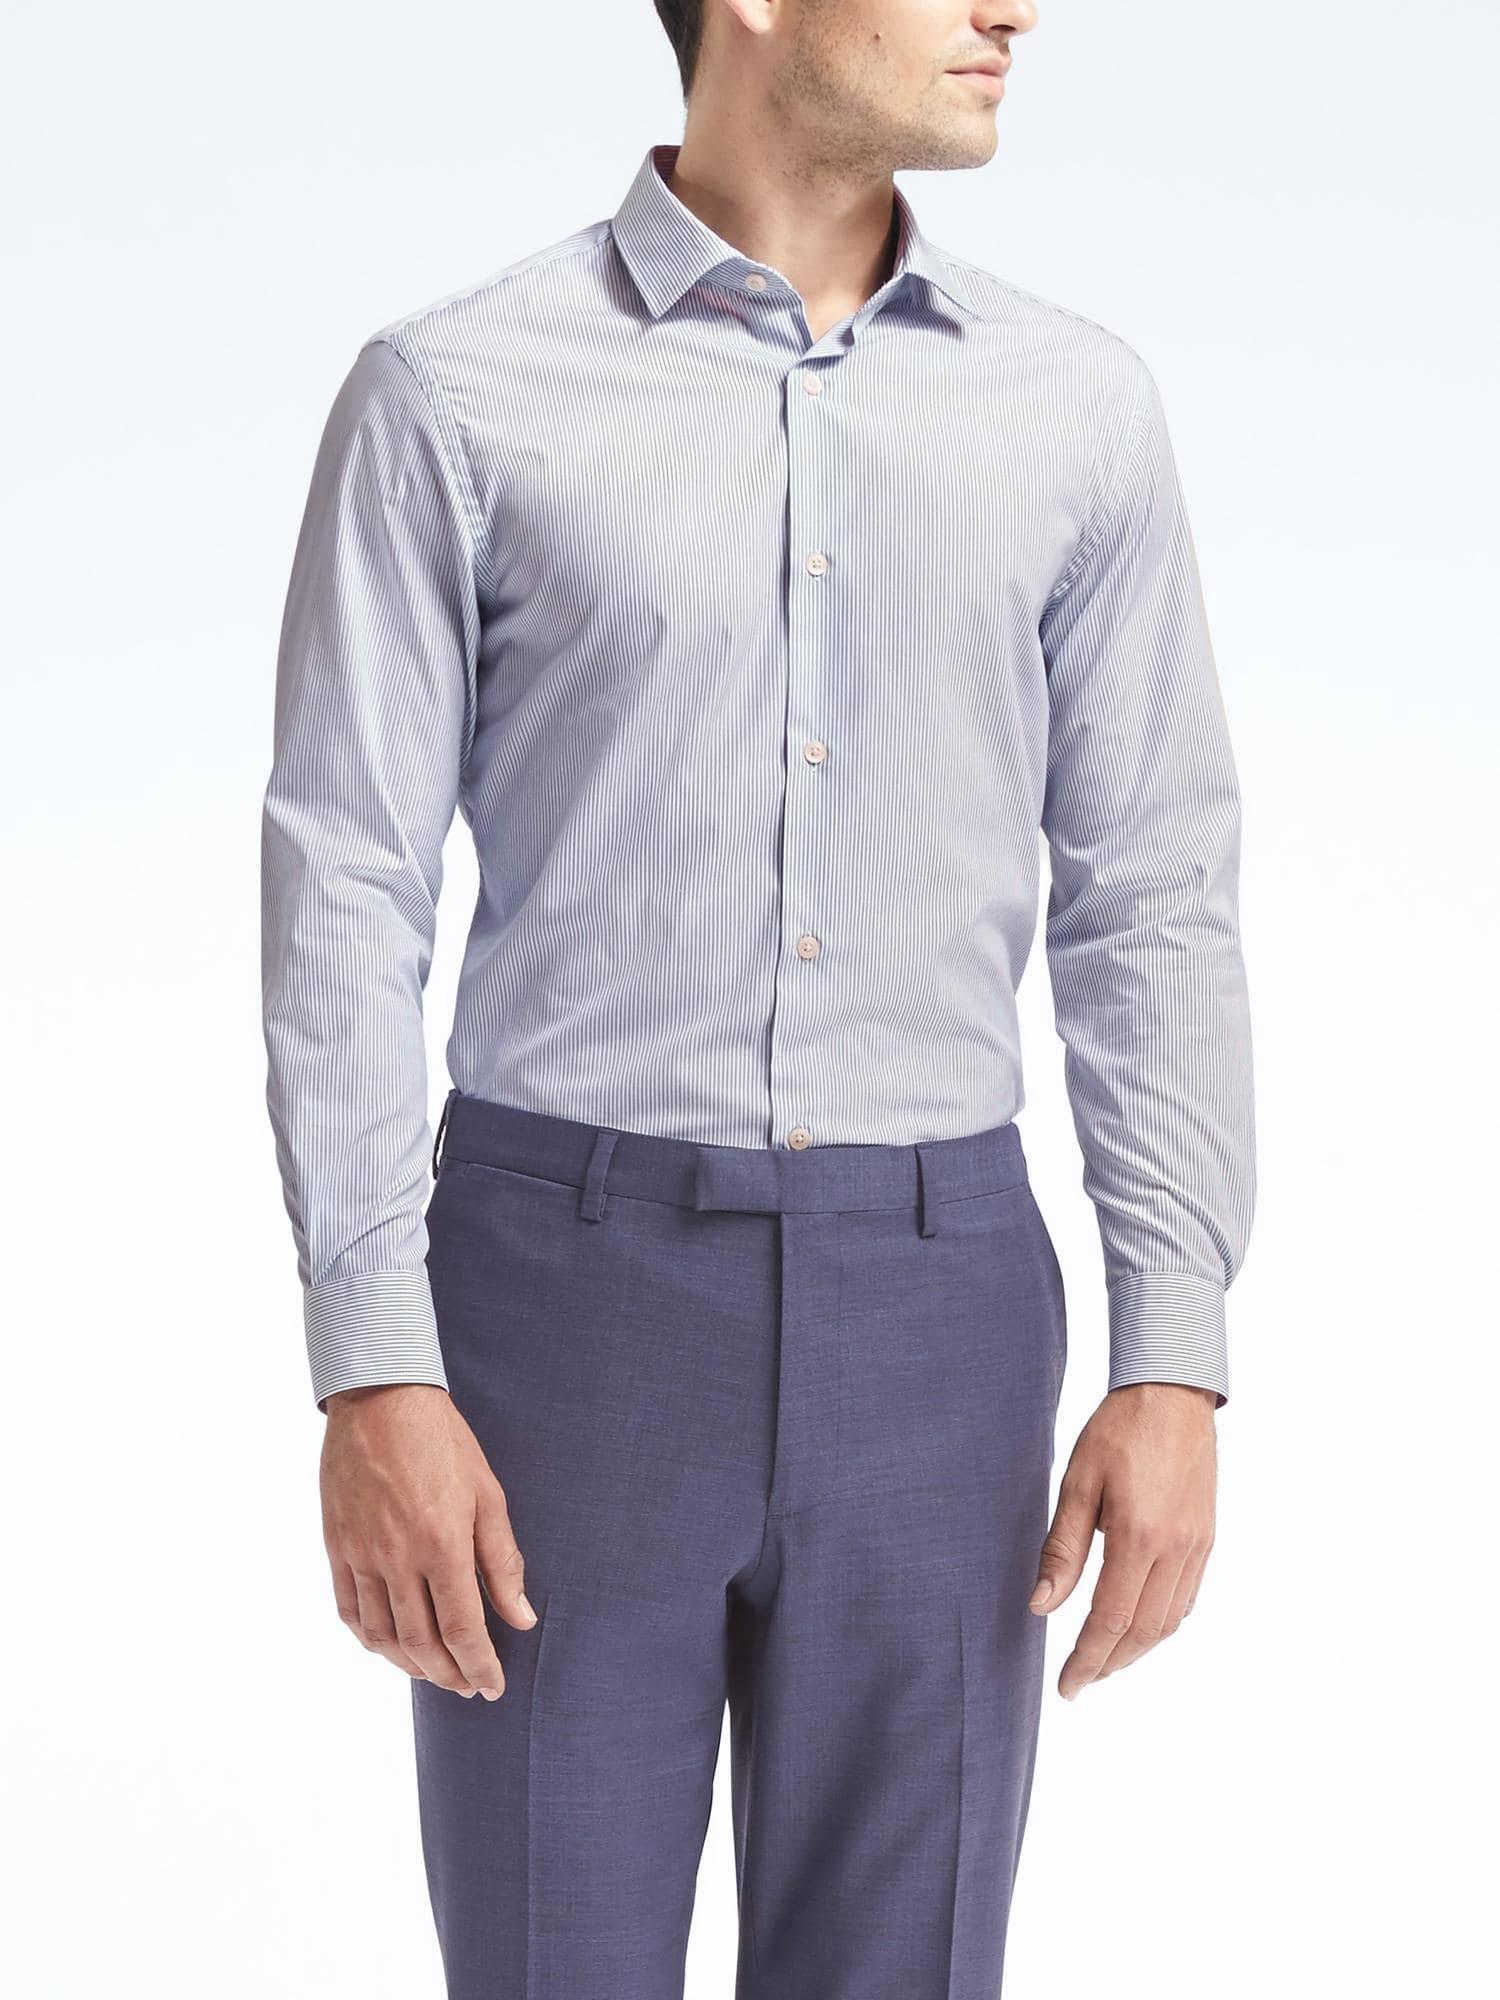 Corte Hierro De Republic Camisa Para Sin Blanca L Vestir Grant Slim Hombres Talla Banana wX8qxX